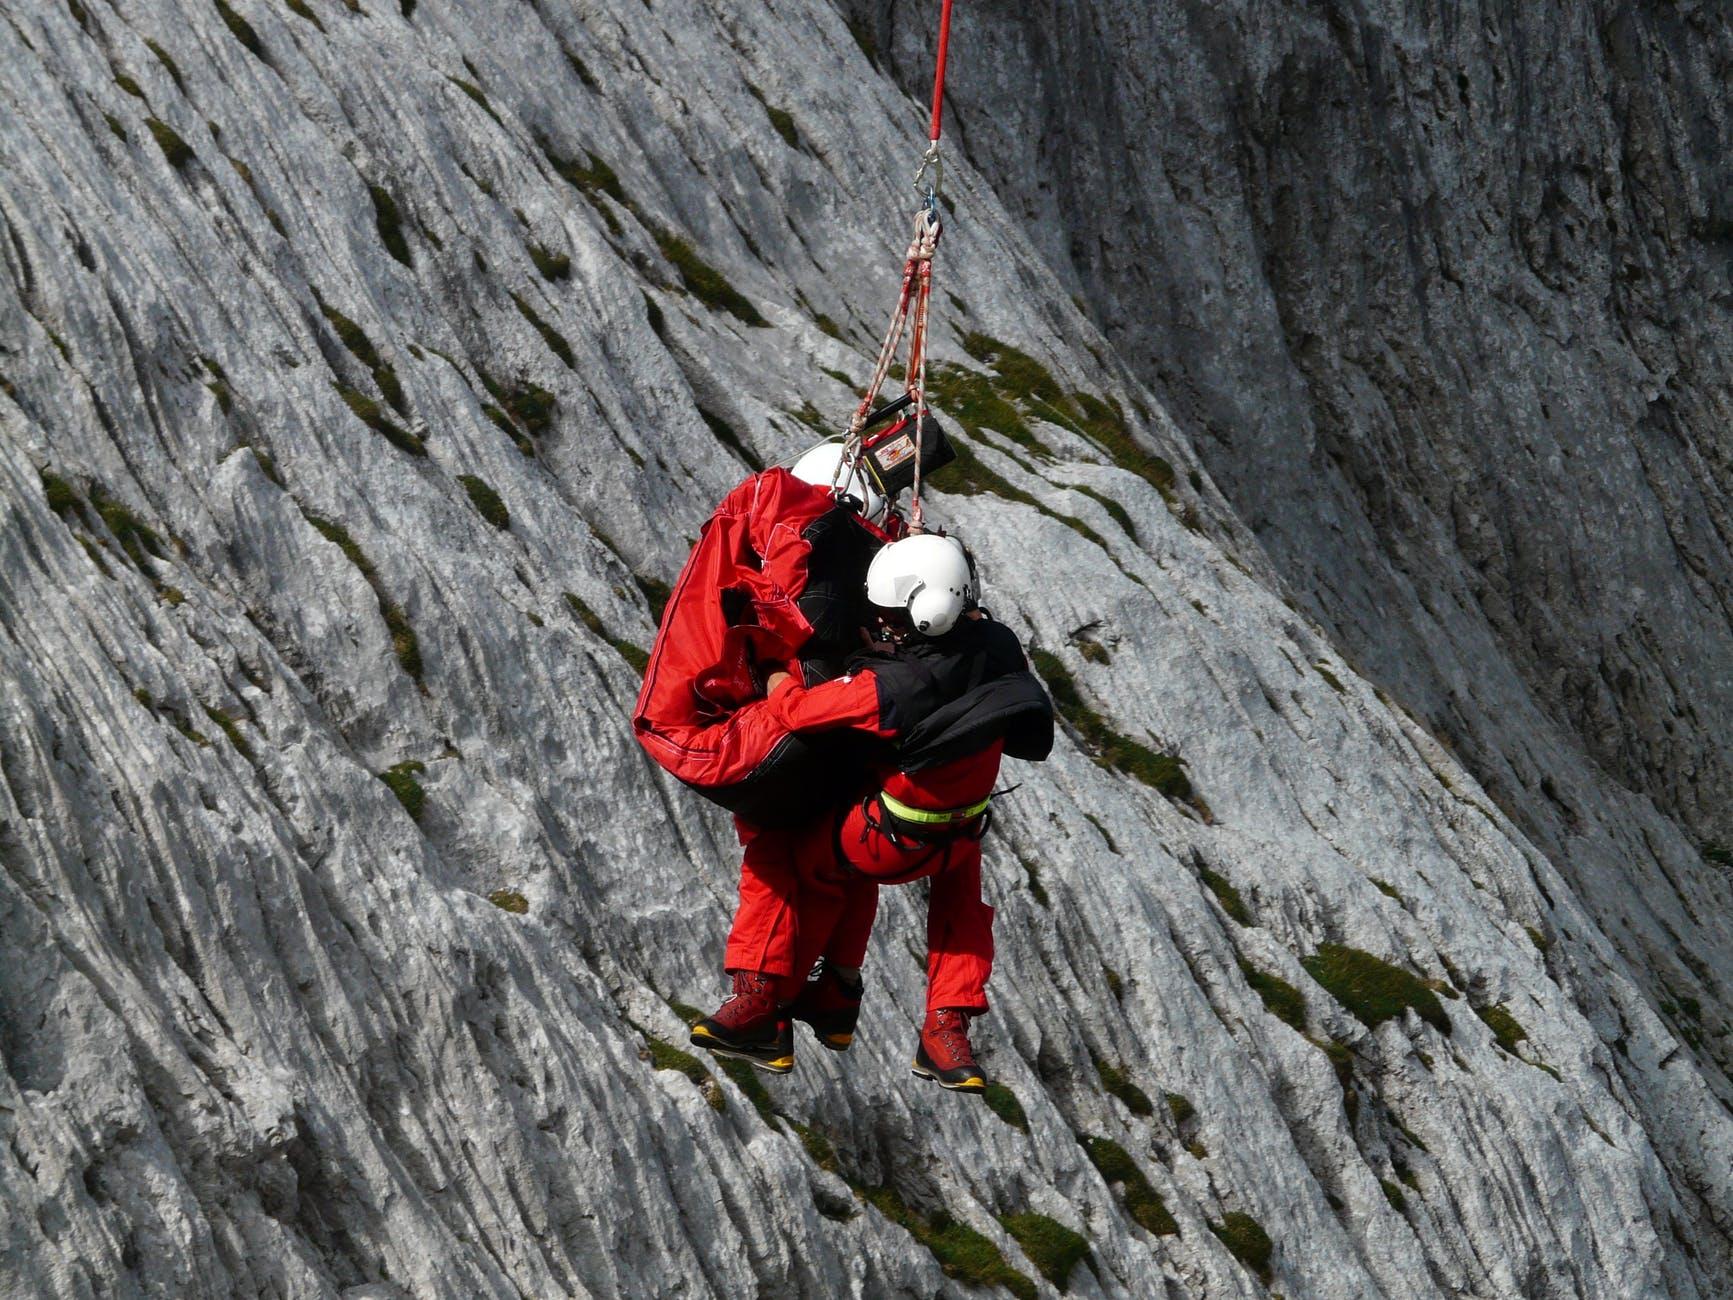 accident action adventure aid